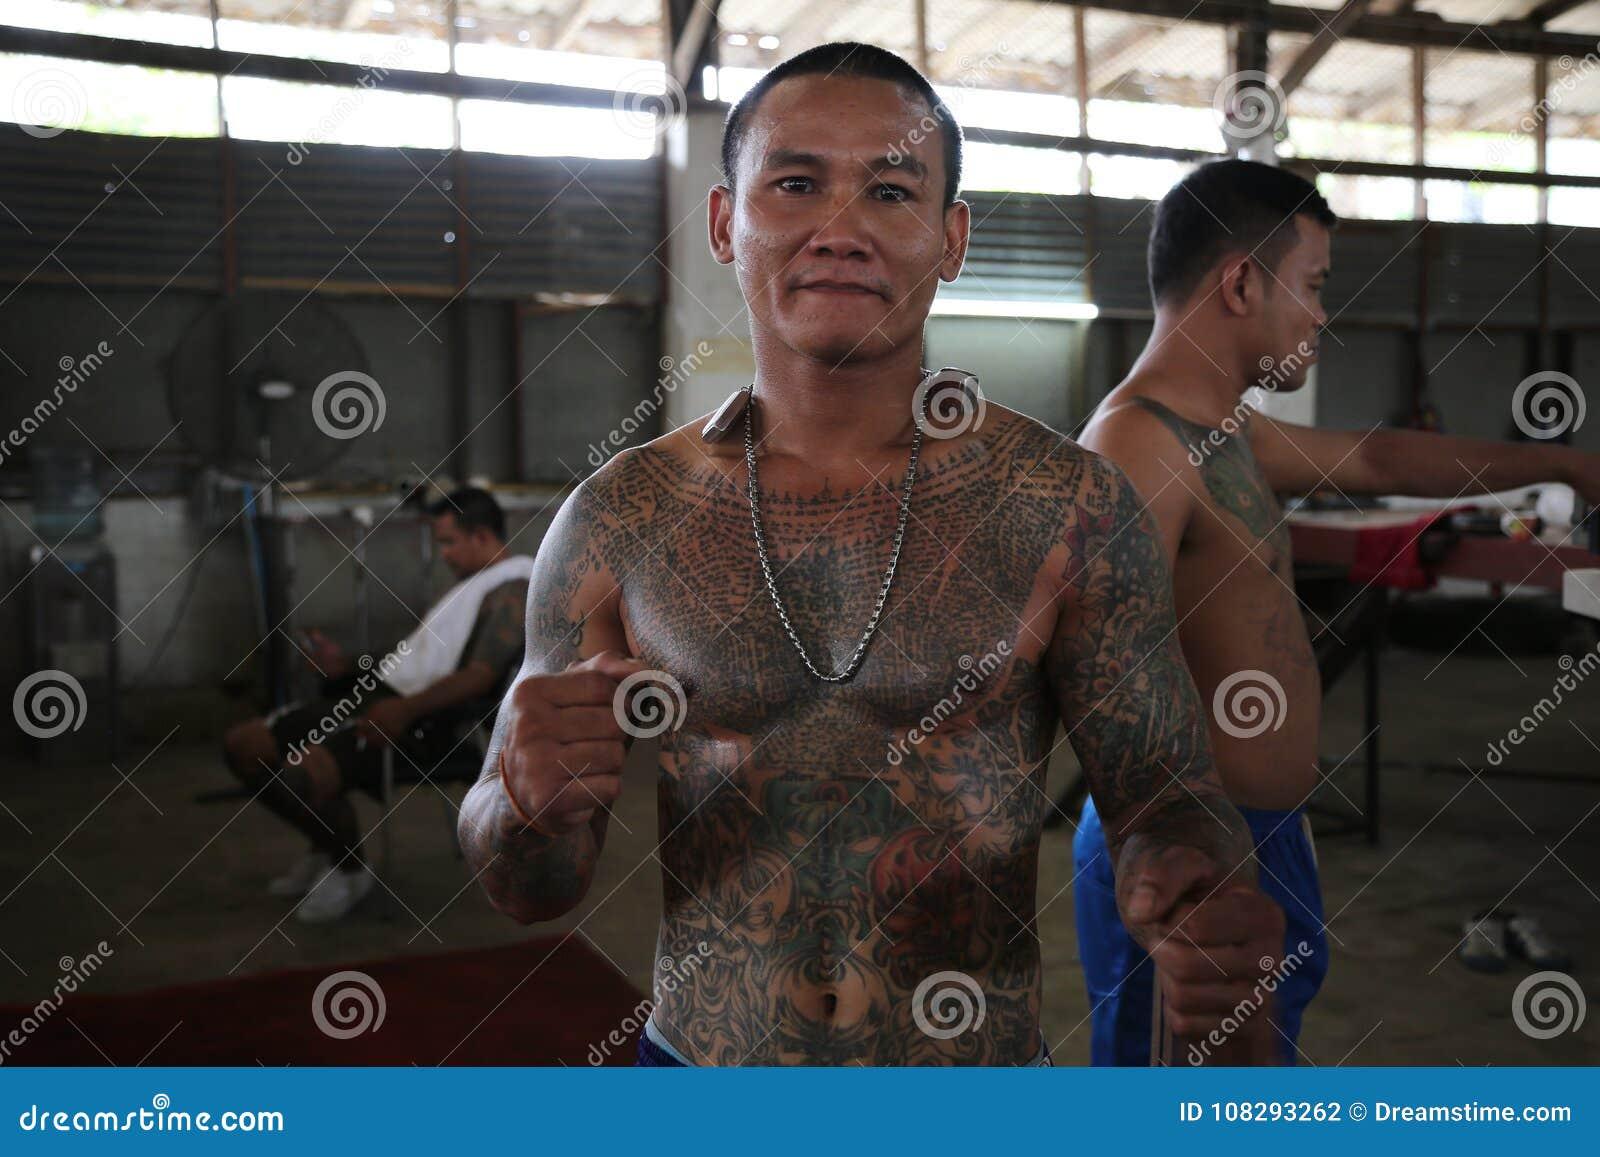 Muay Thai Prison Fighter